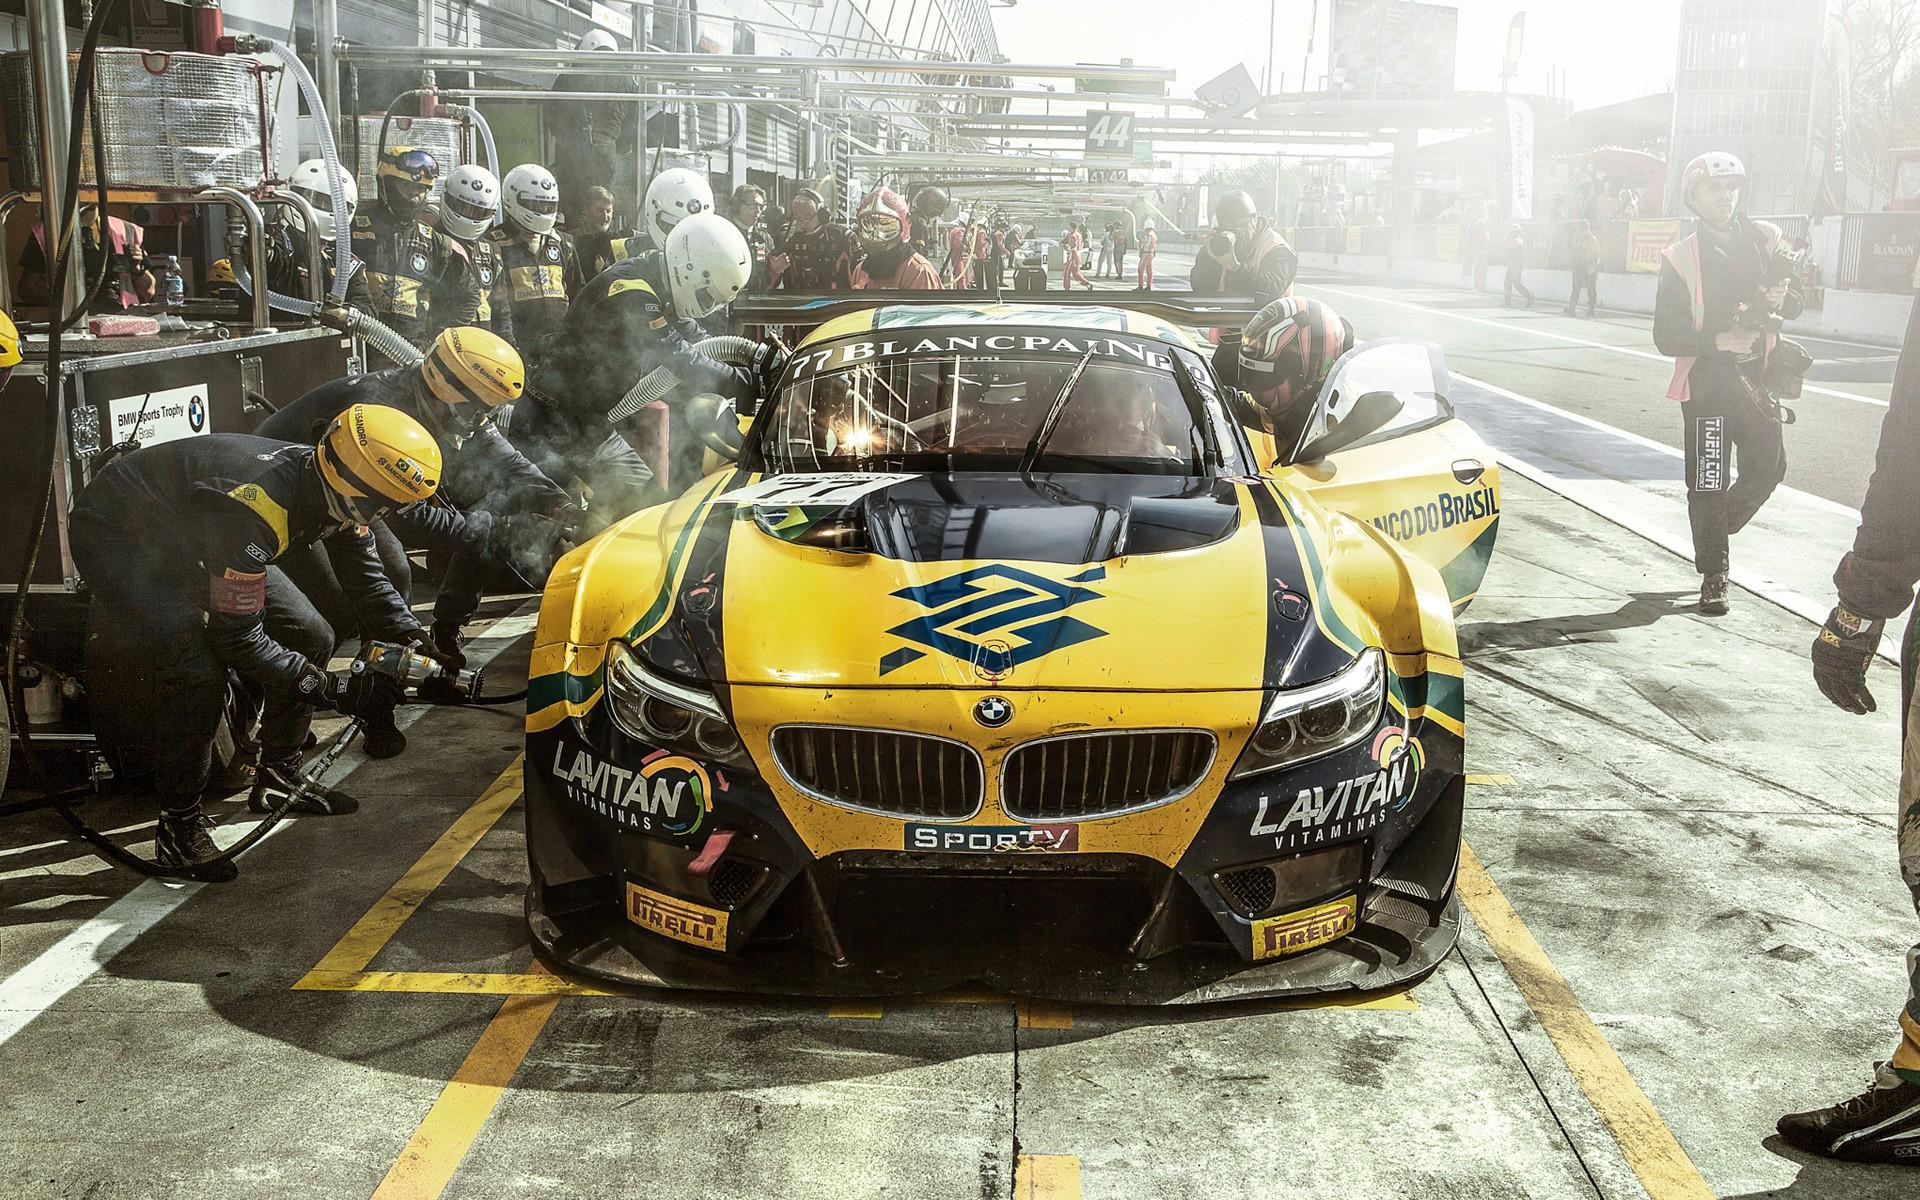 team brazil pit stop sports racing bmw race cars car